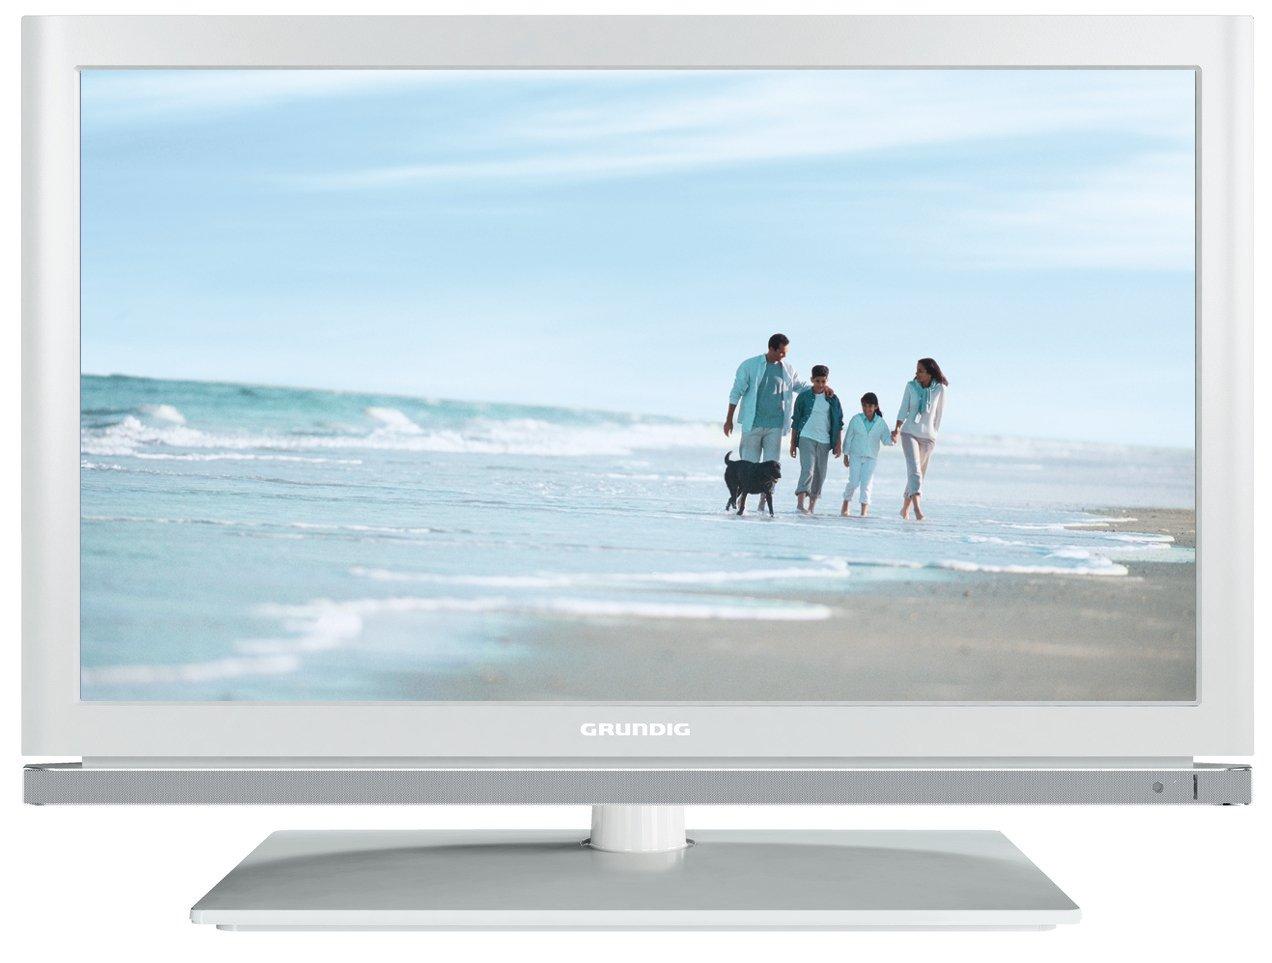 Grundig 22 VLE 8320 WG - Televisor (pantalla de 22